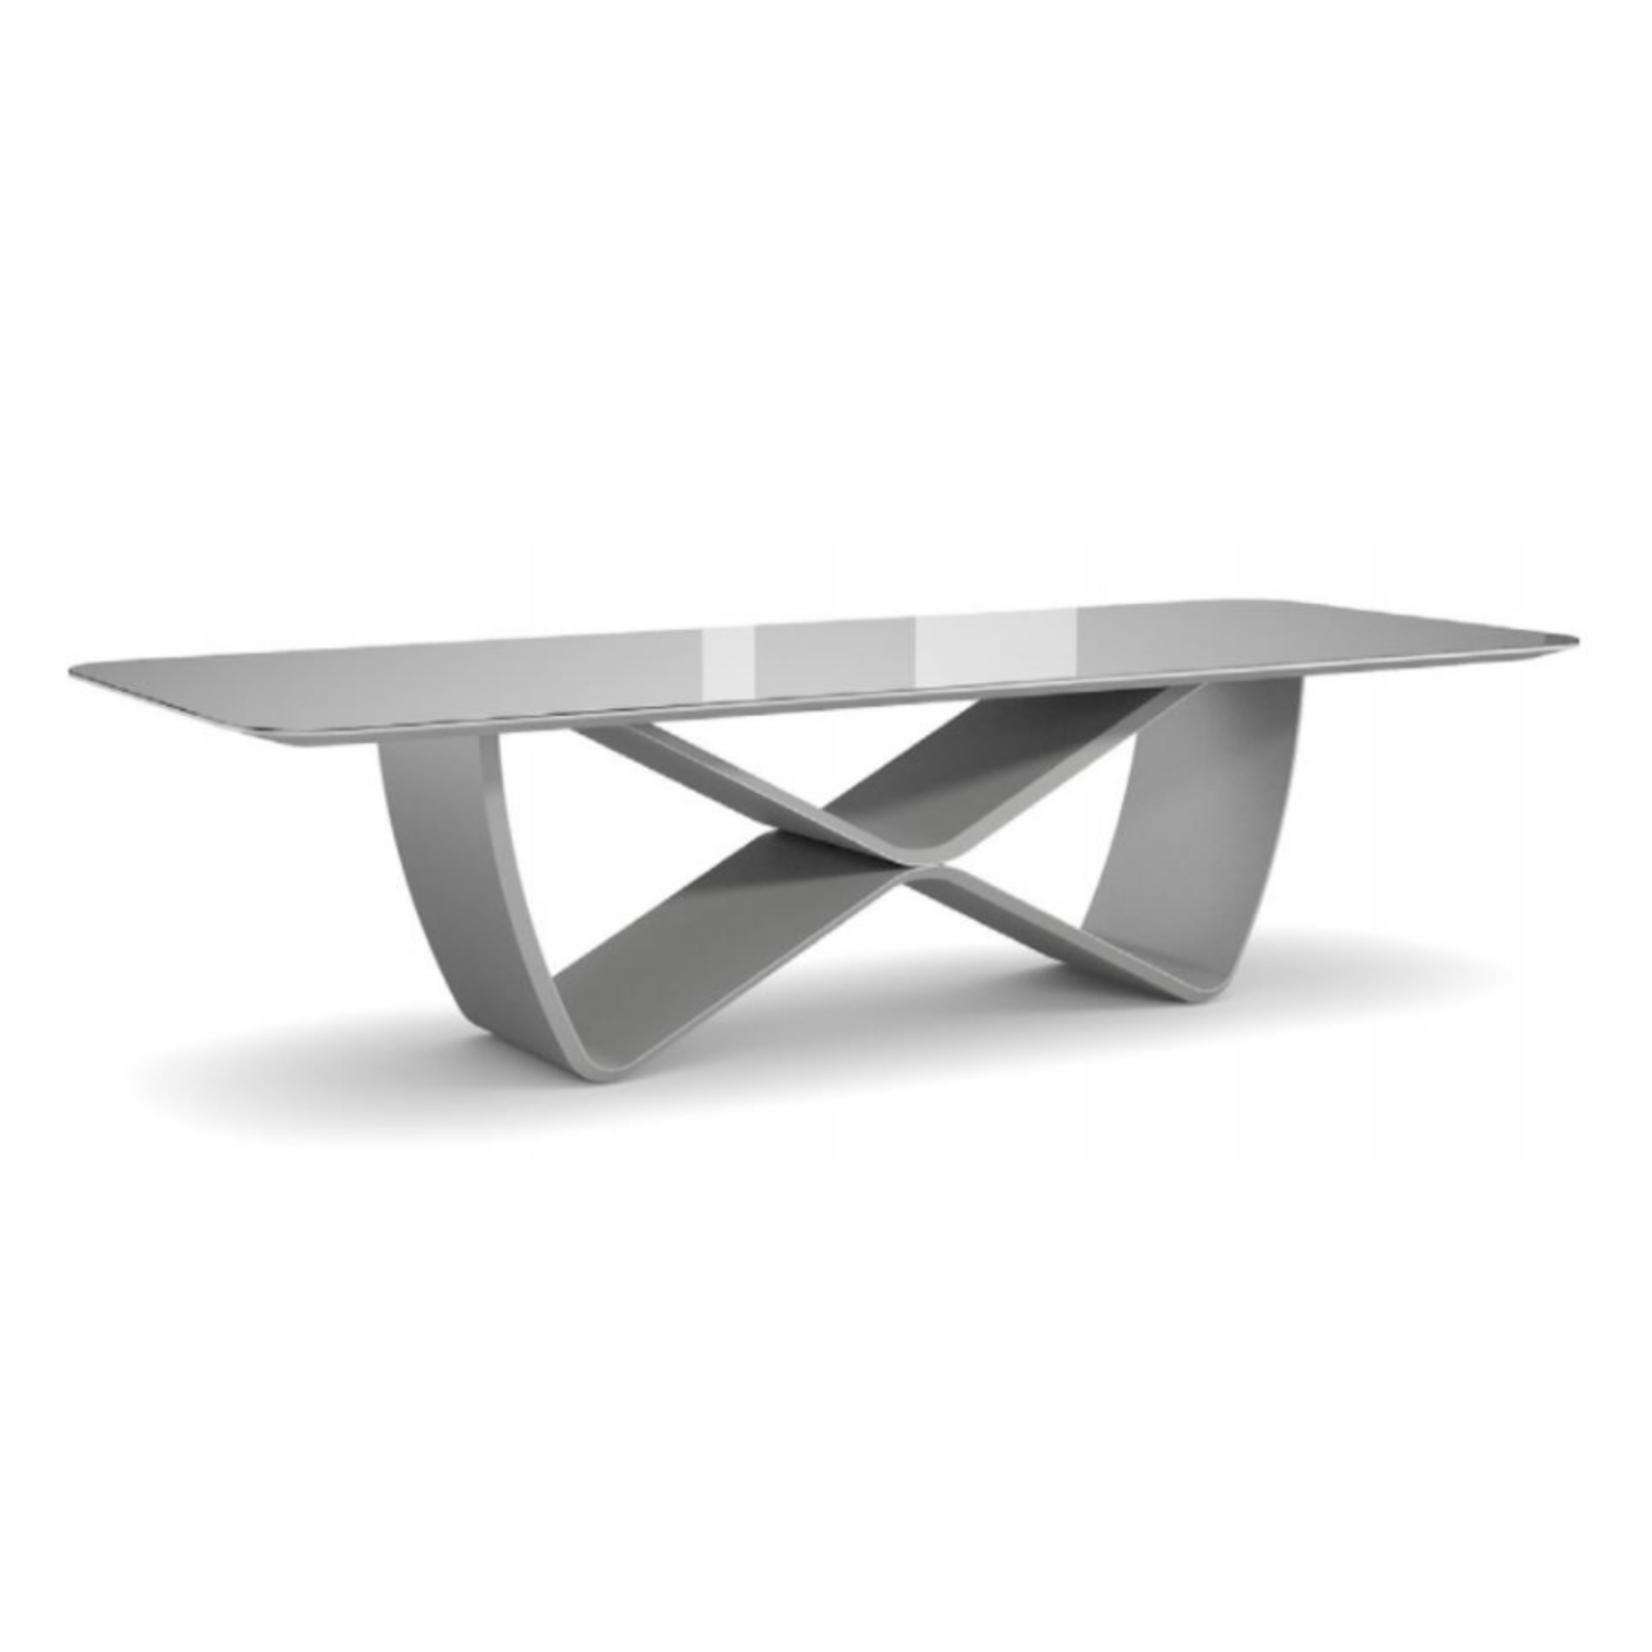 Harmony Studio Infinity Dining Table